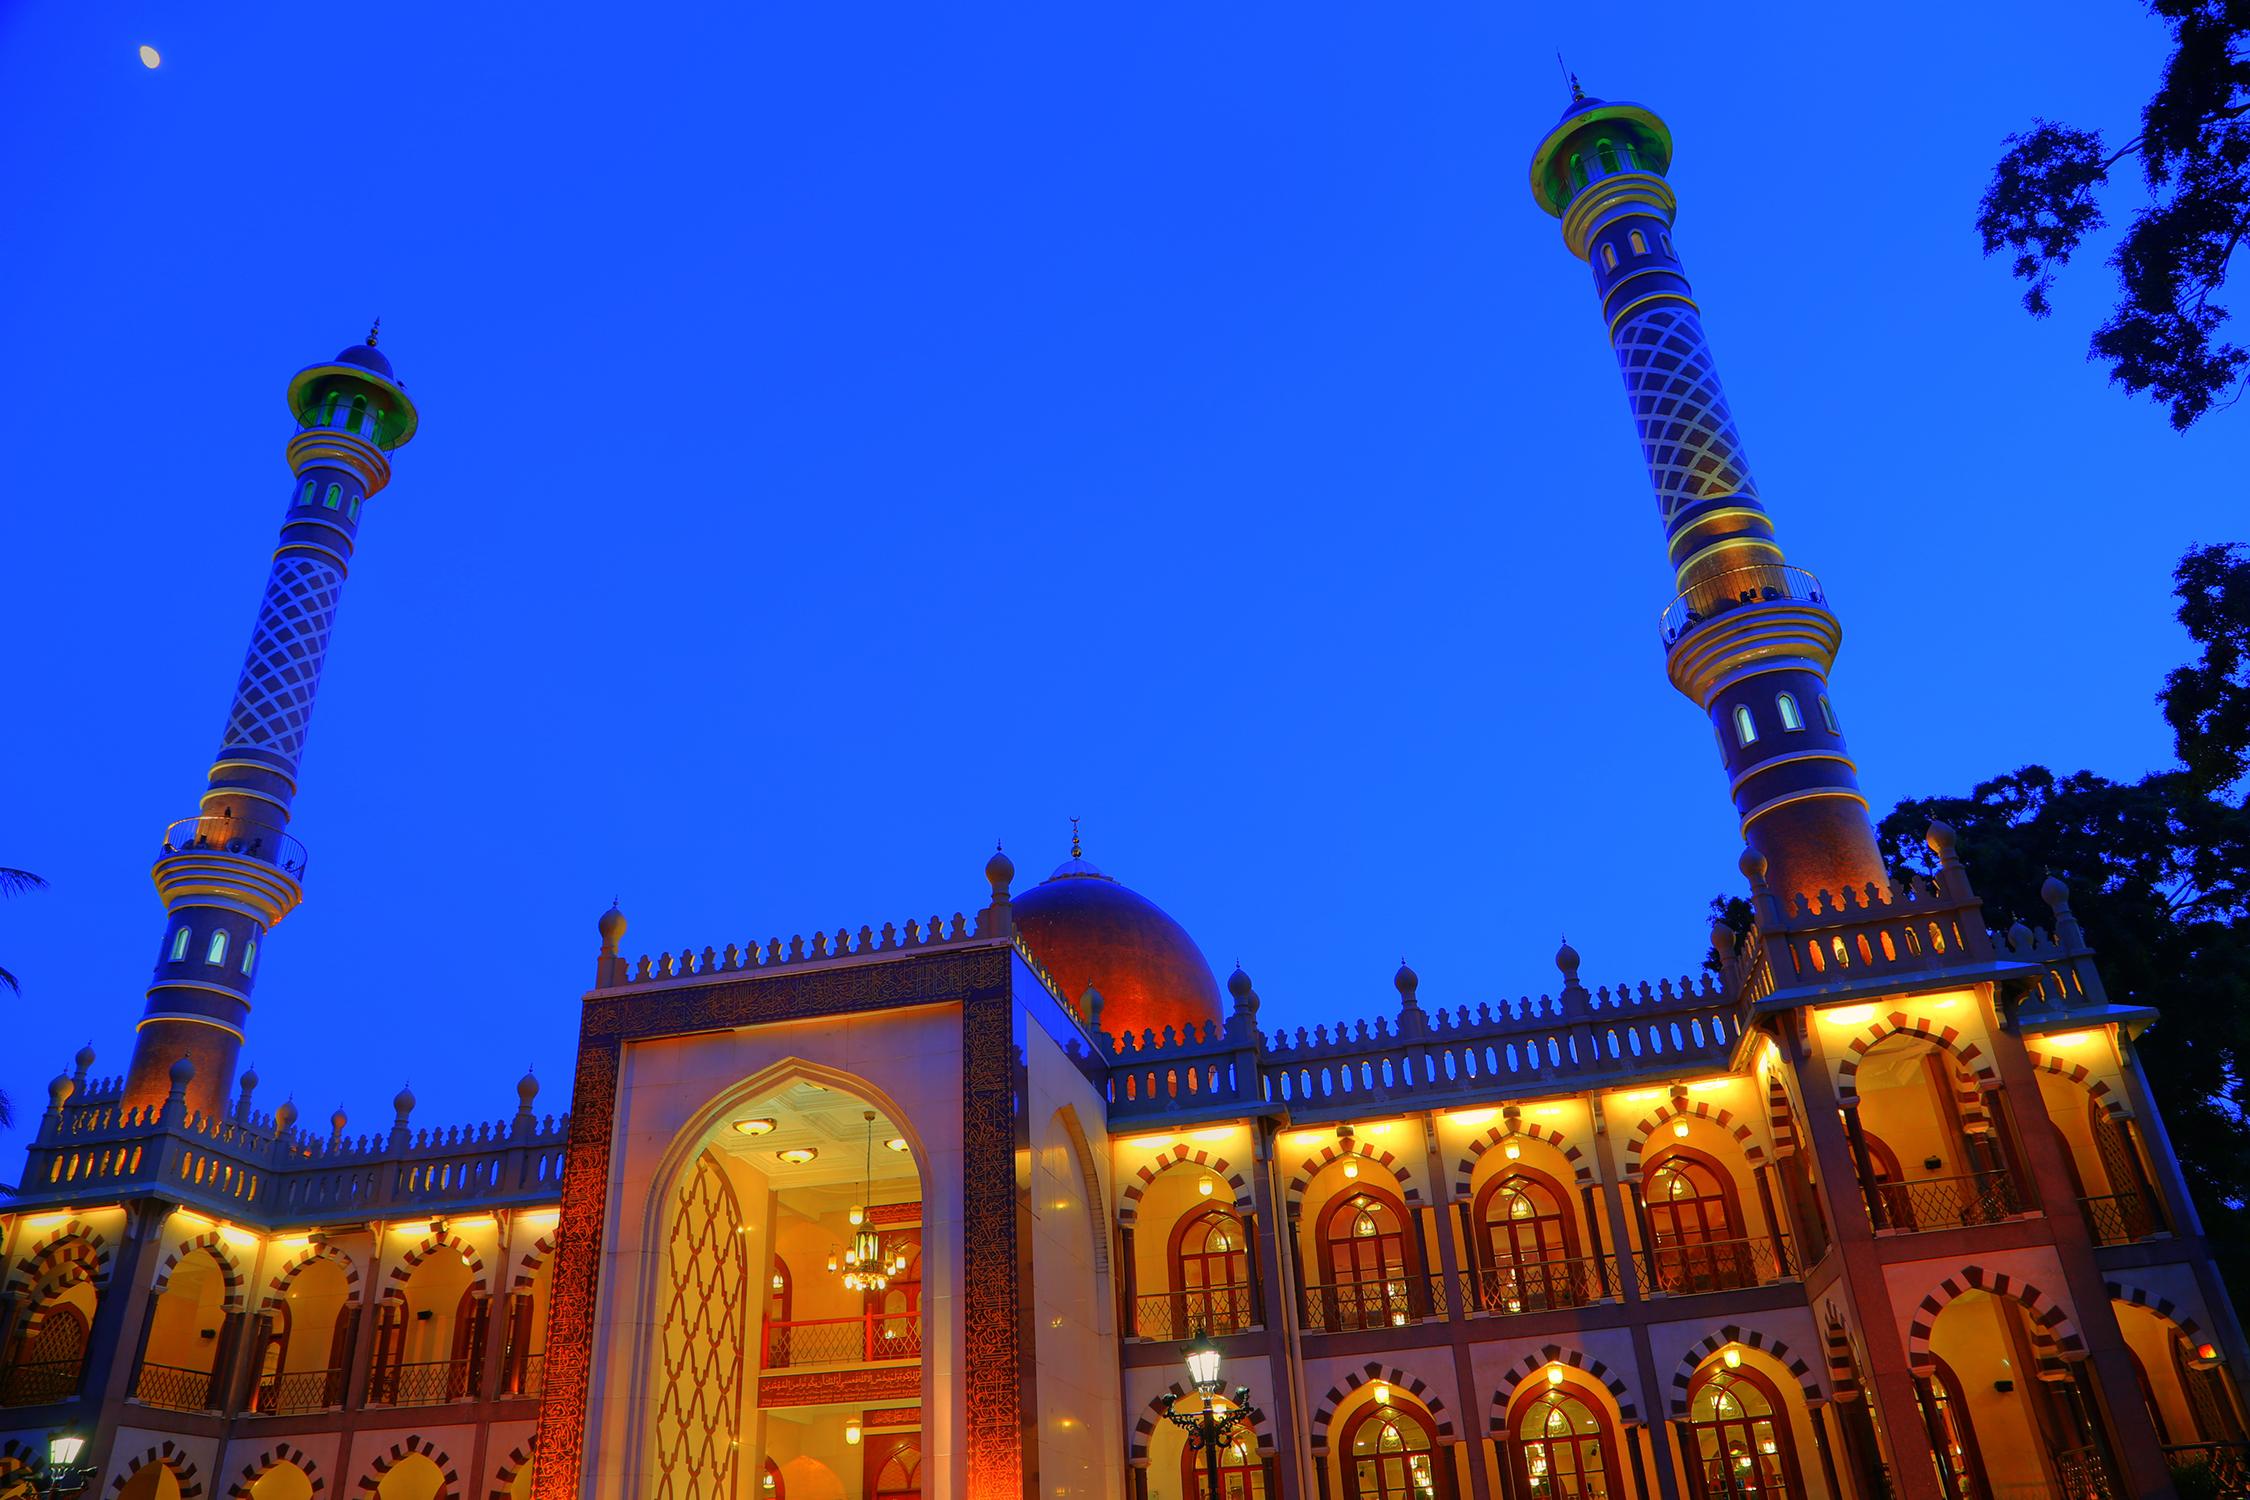 File:Masjid Khadria, Jumma Masjid, Bangalore.jpg - Wikimedia Commons